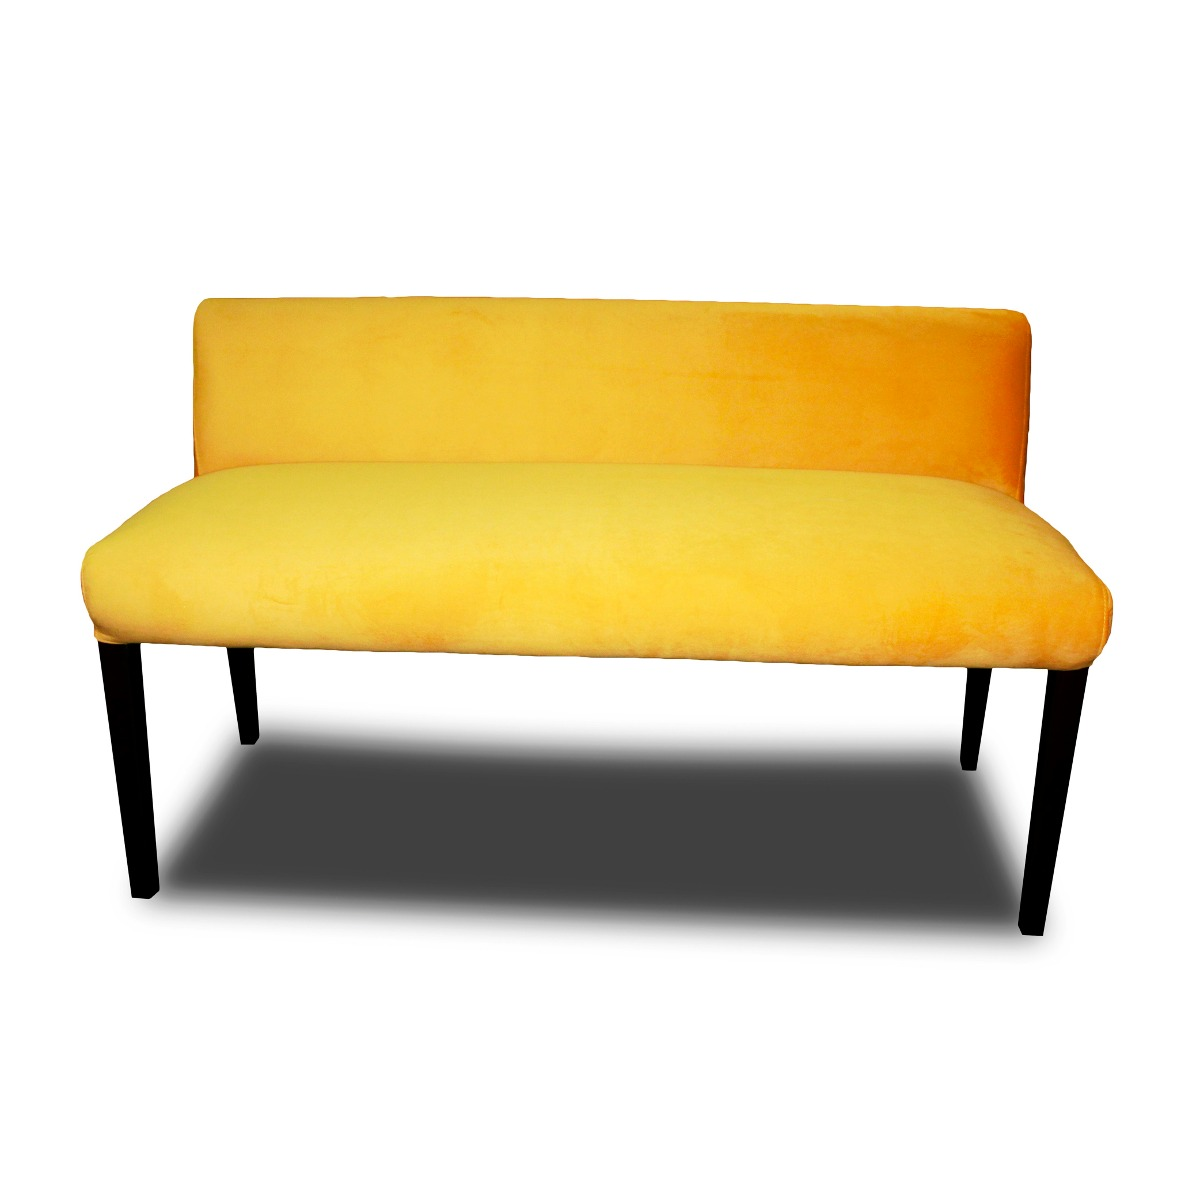 Muebles sala baratos ideas de disenos for Mueble escobero barato